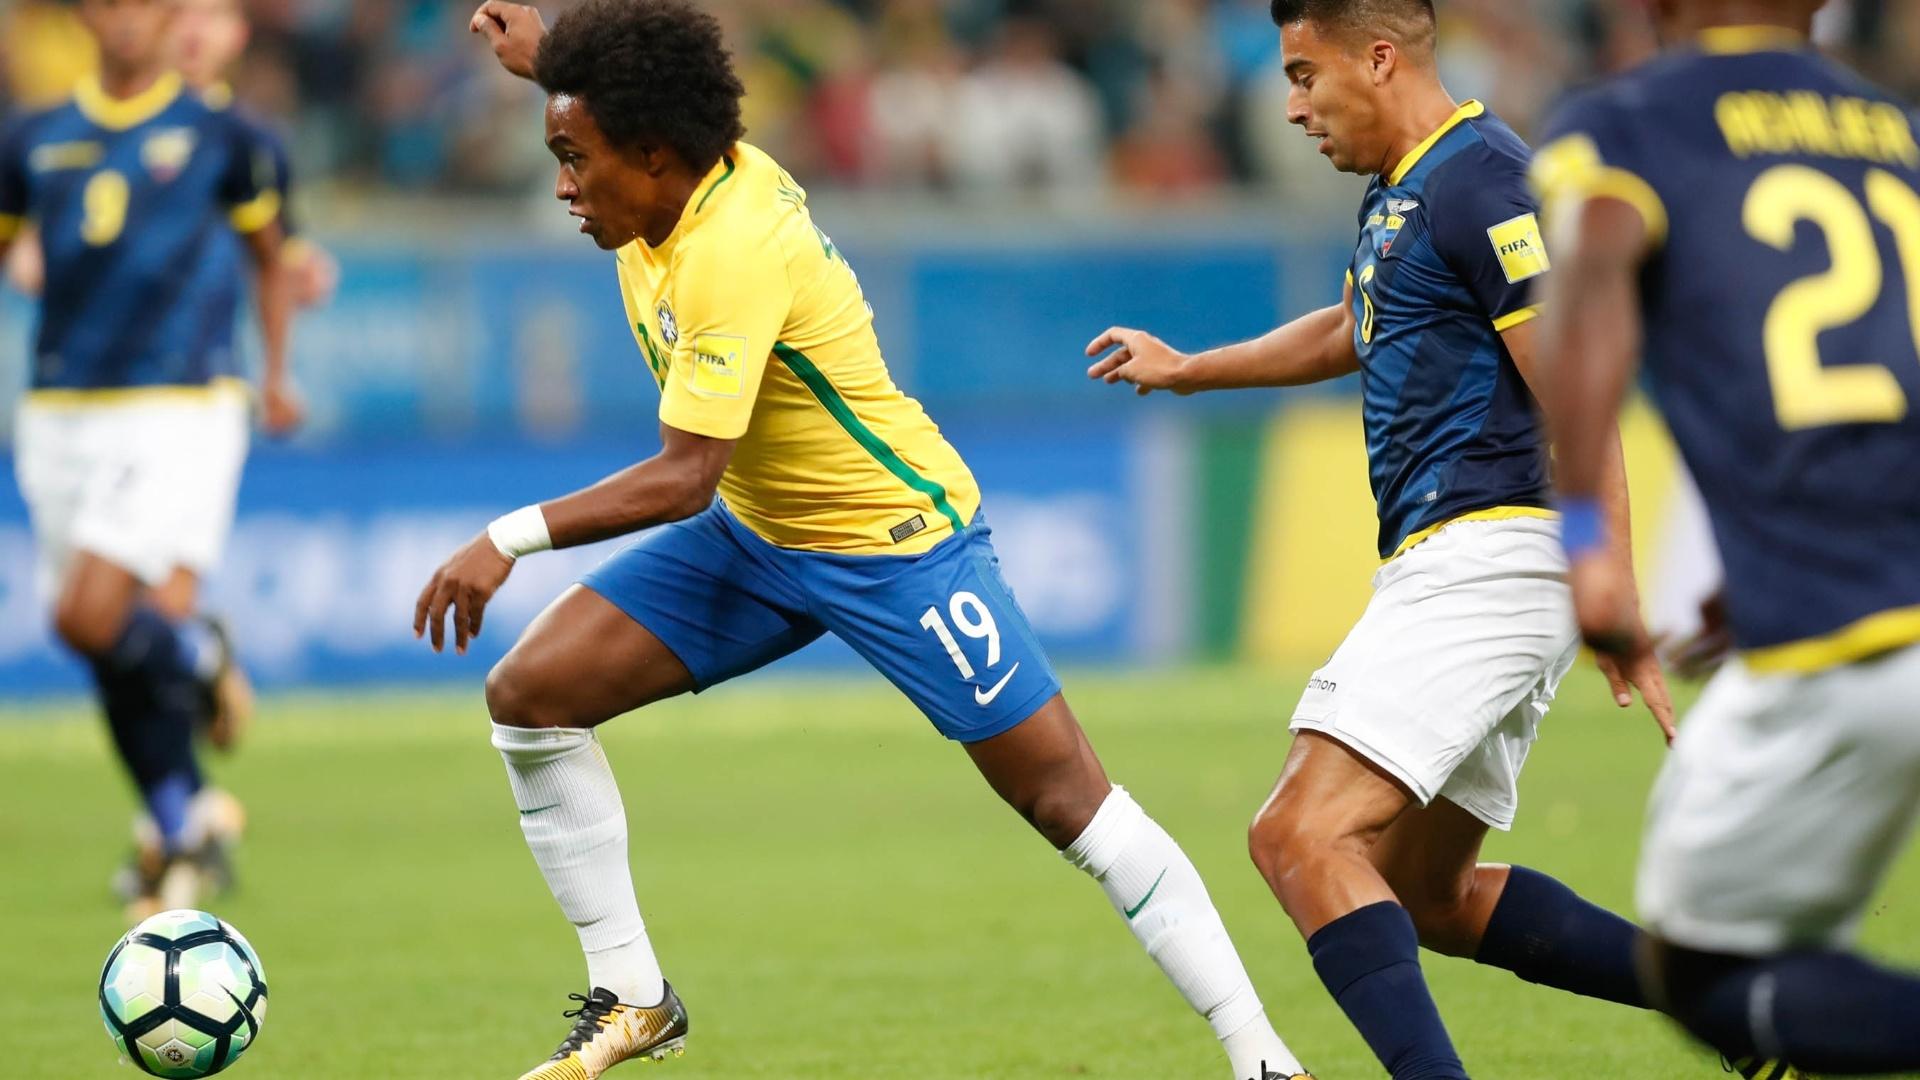 Willian foge da marcação equatoriana na Arena Grêmio